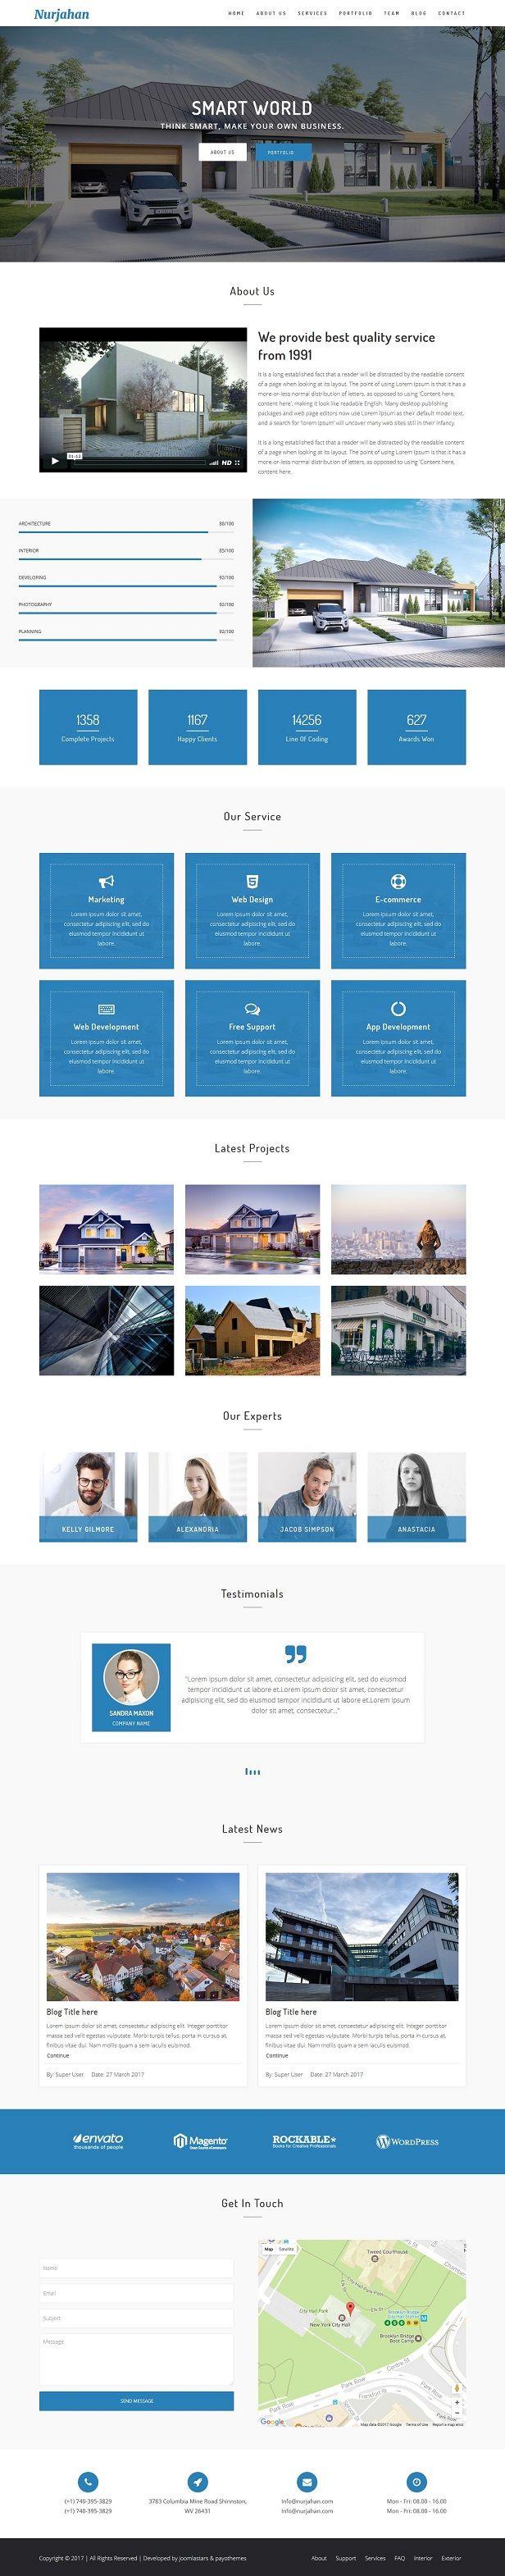 Nurjahan - Creative Architecture & Interior Business Joomla Theme   #joomla #theme #template #themeforest #envato #windstripethemes #business #mobile #responsive #interior #architecture #design #realestate